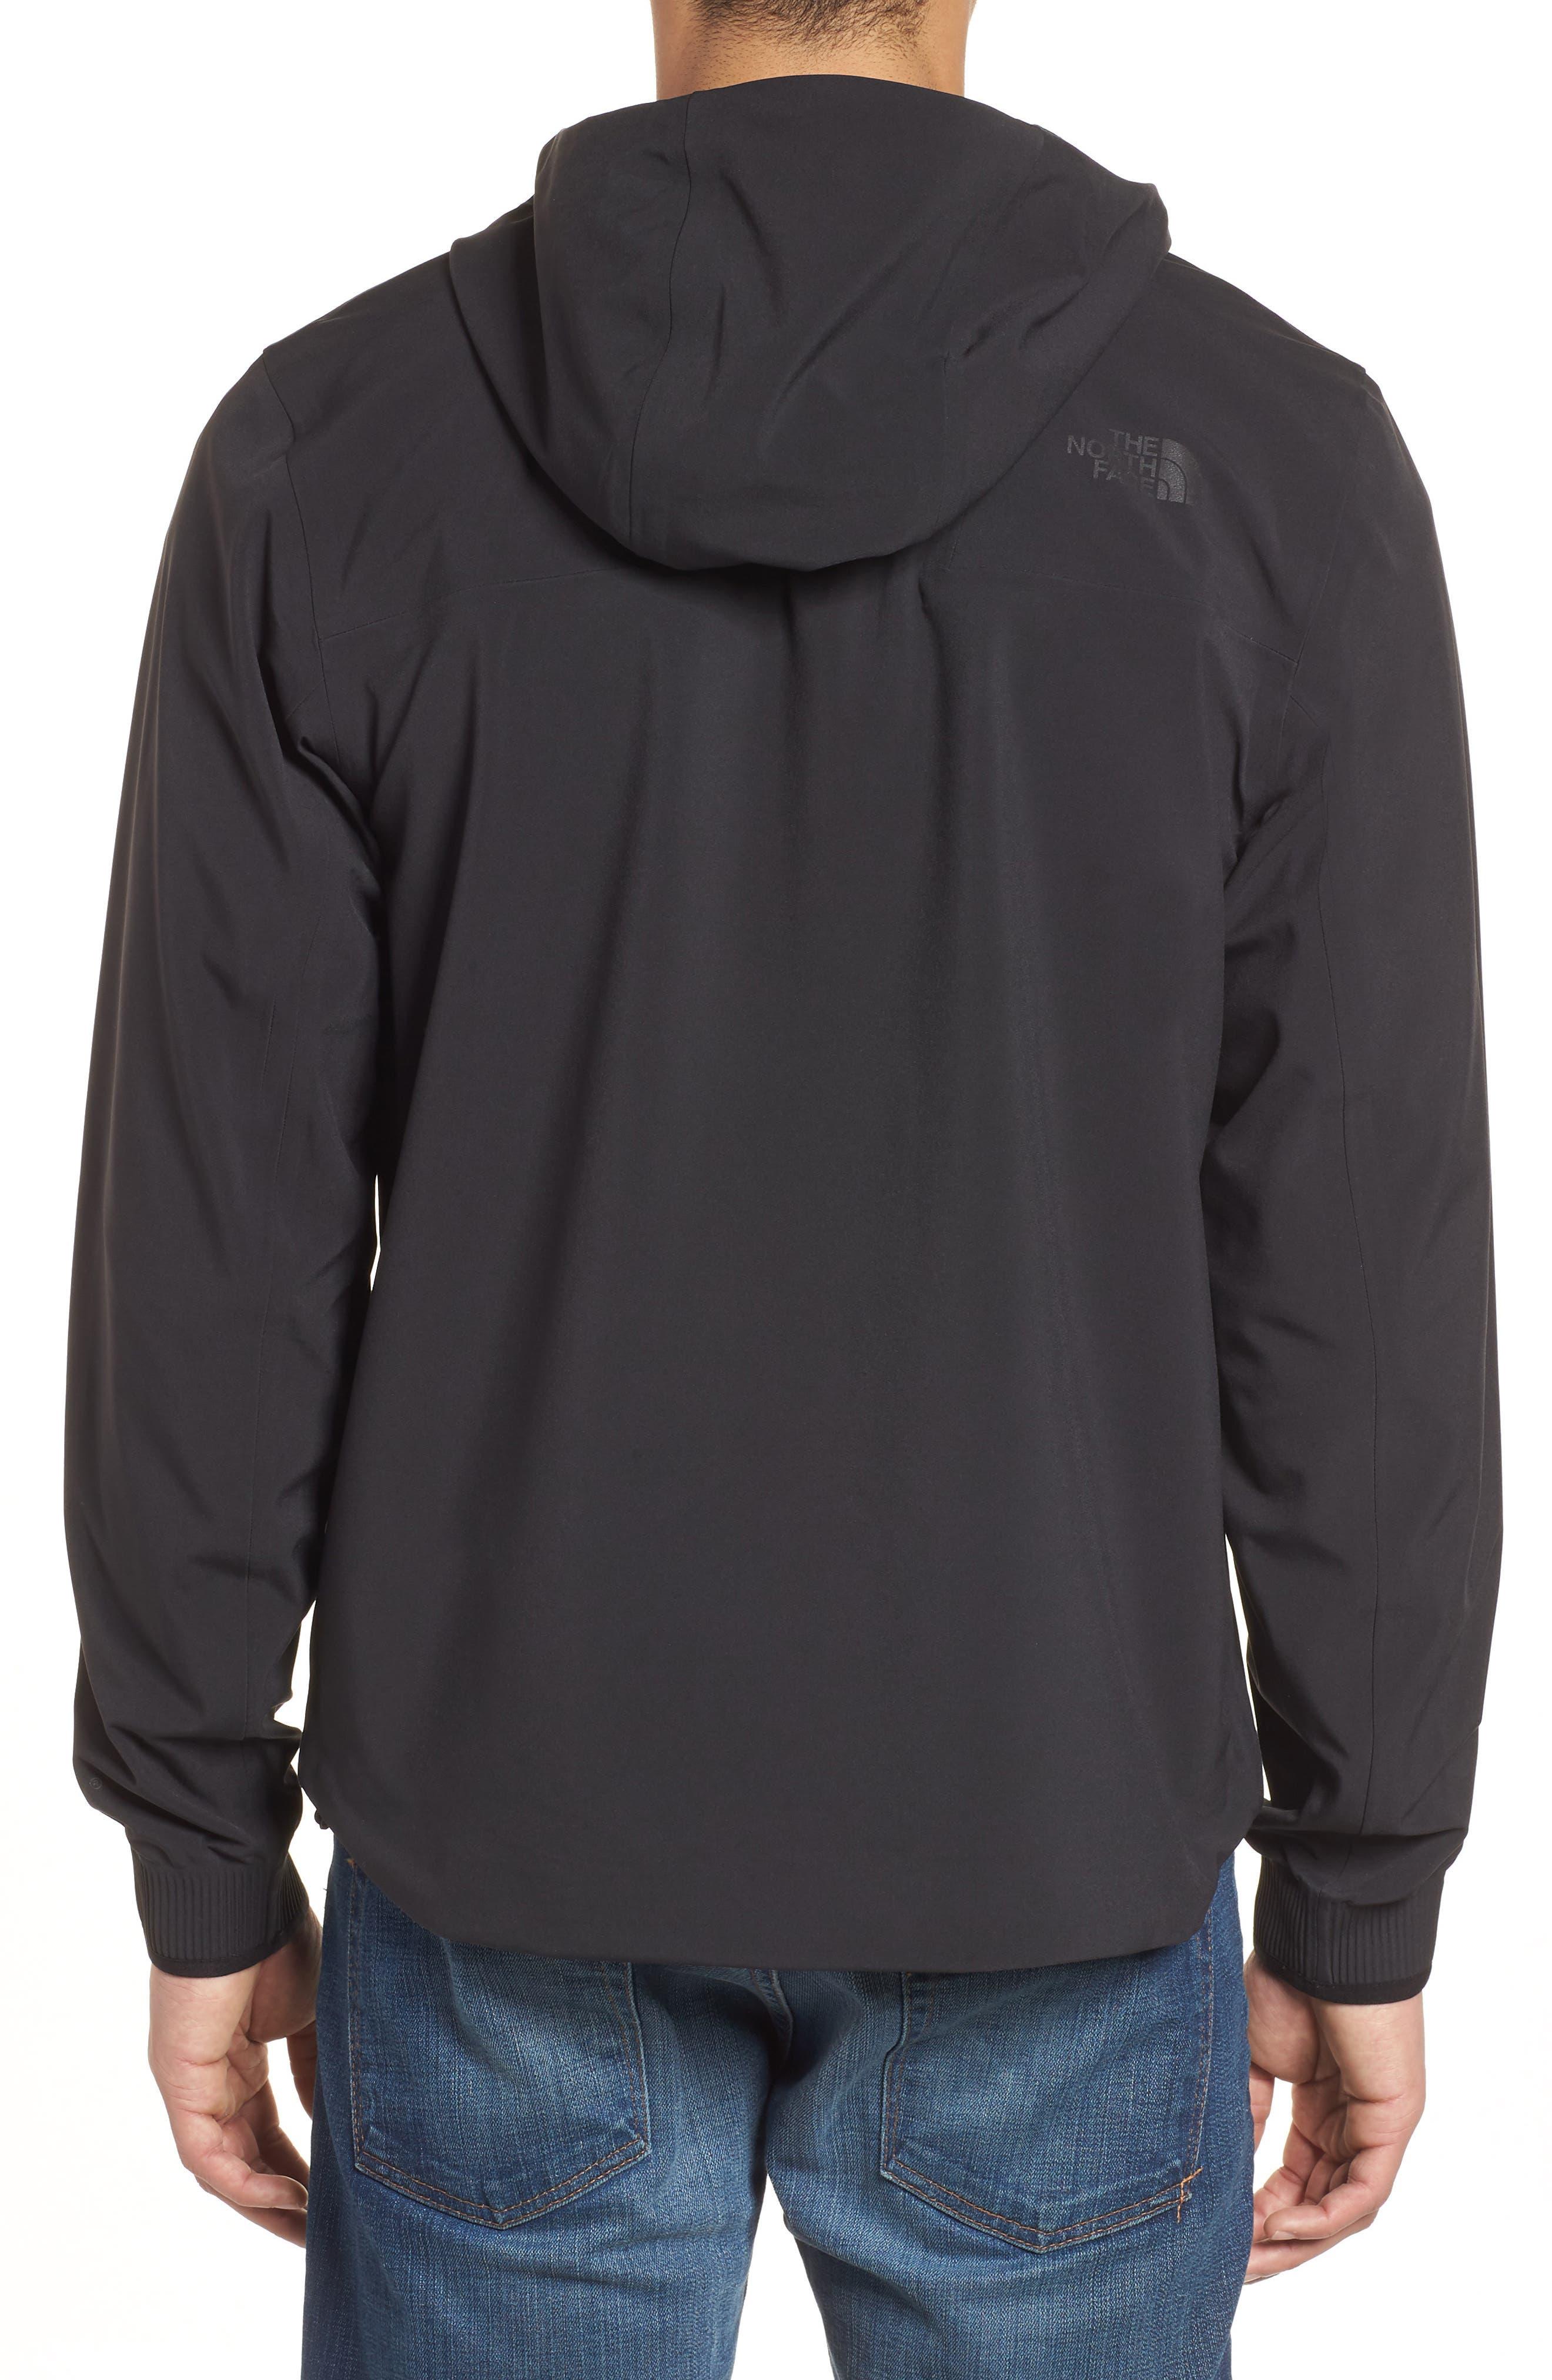 Apex Flex Gore-Tex<sup>®</sup> Waterproof Jacket,                             Alternate thumbnail 5, color,